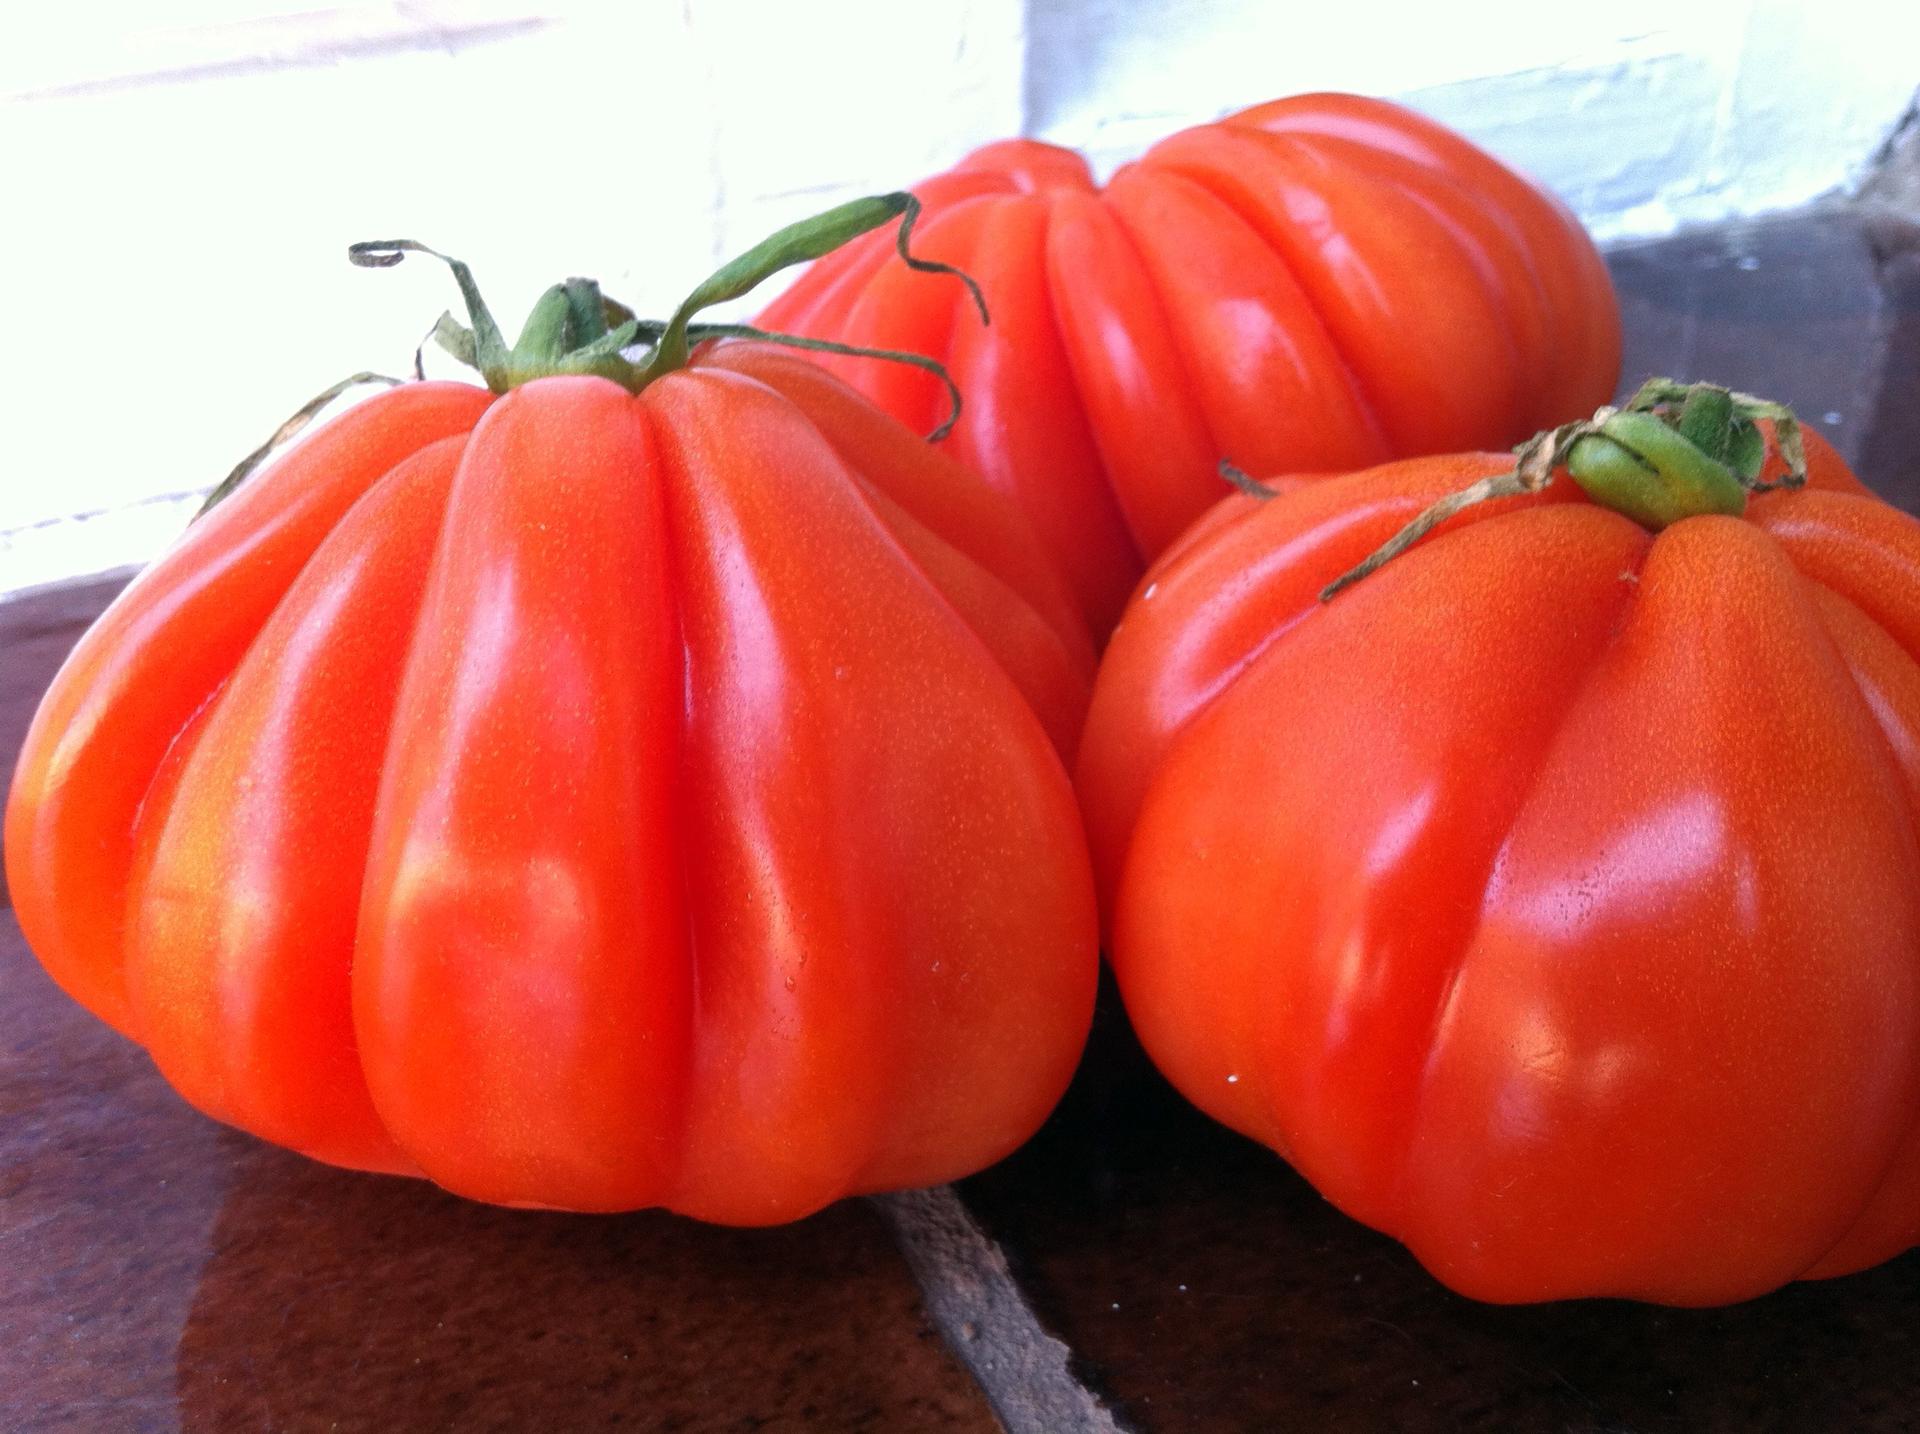 Tomatoes   gato.gordi, agriculture, antioxidant, crop